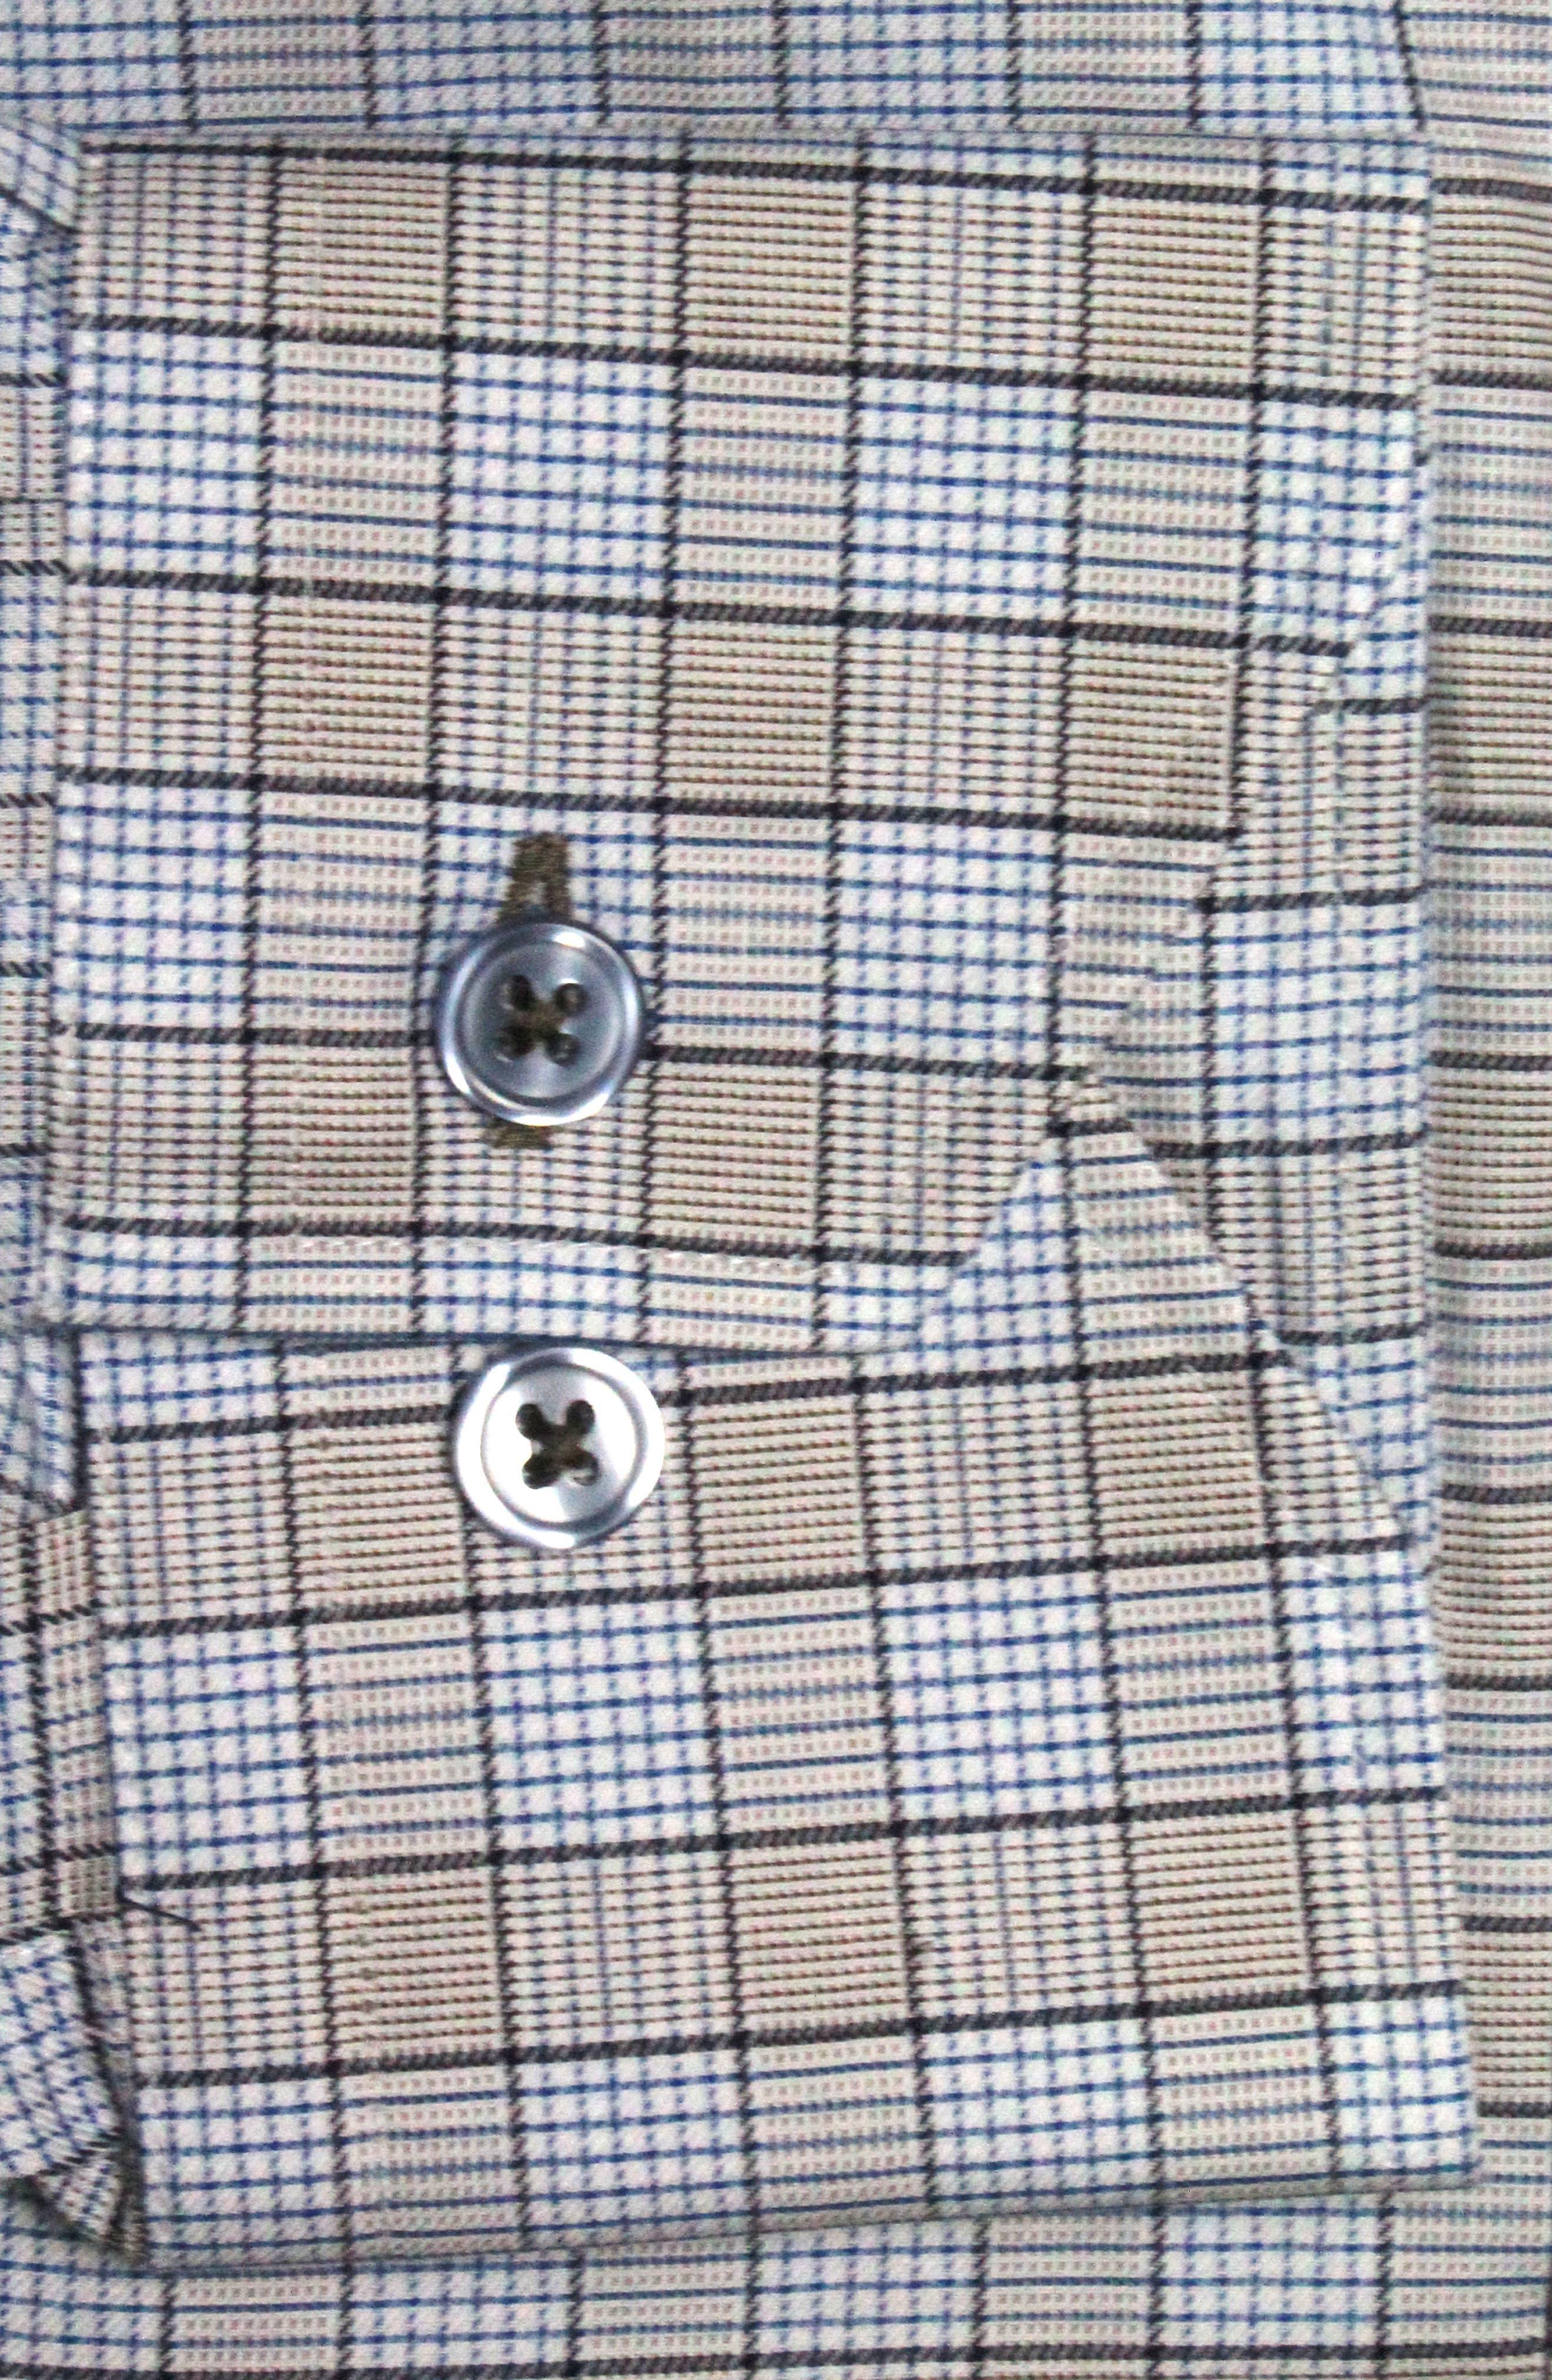 Trim Fit Box Check Dress Shirt,                             Alternate thumbnail 2, color,                             Tan/ Light Blue